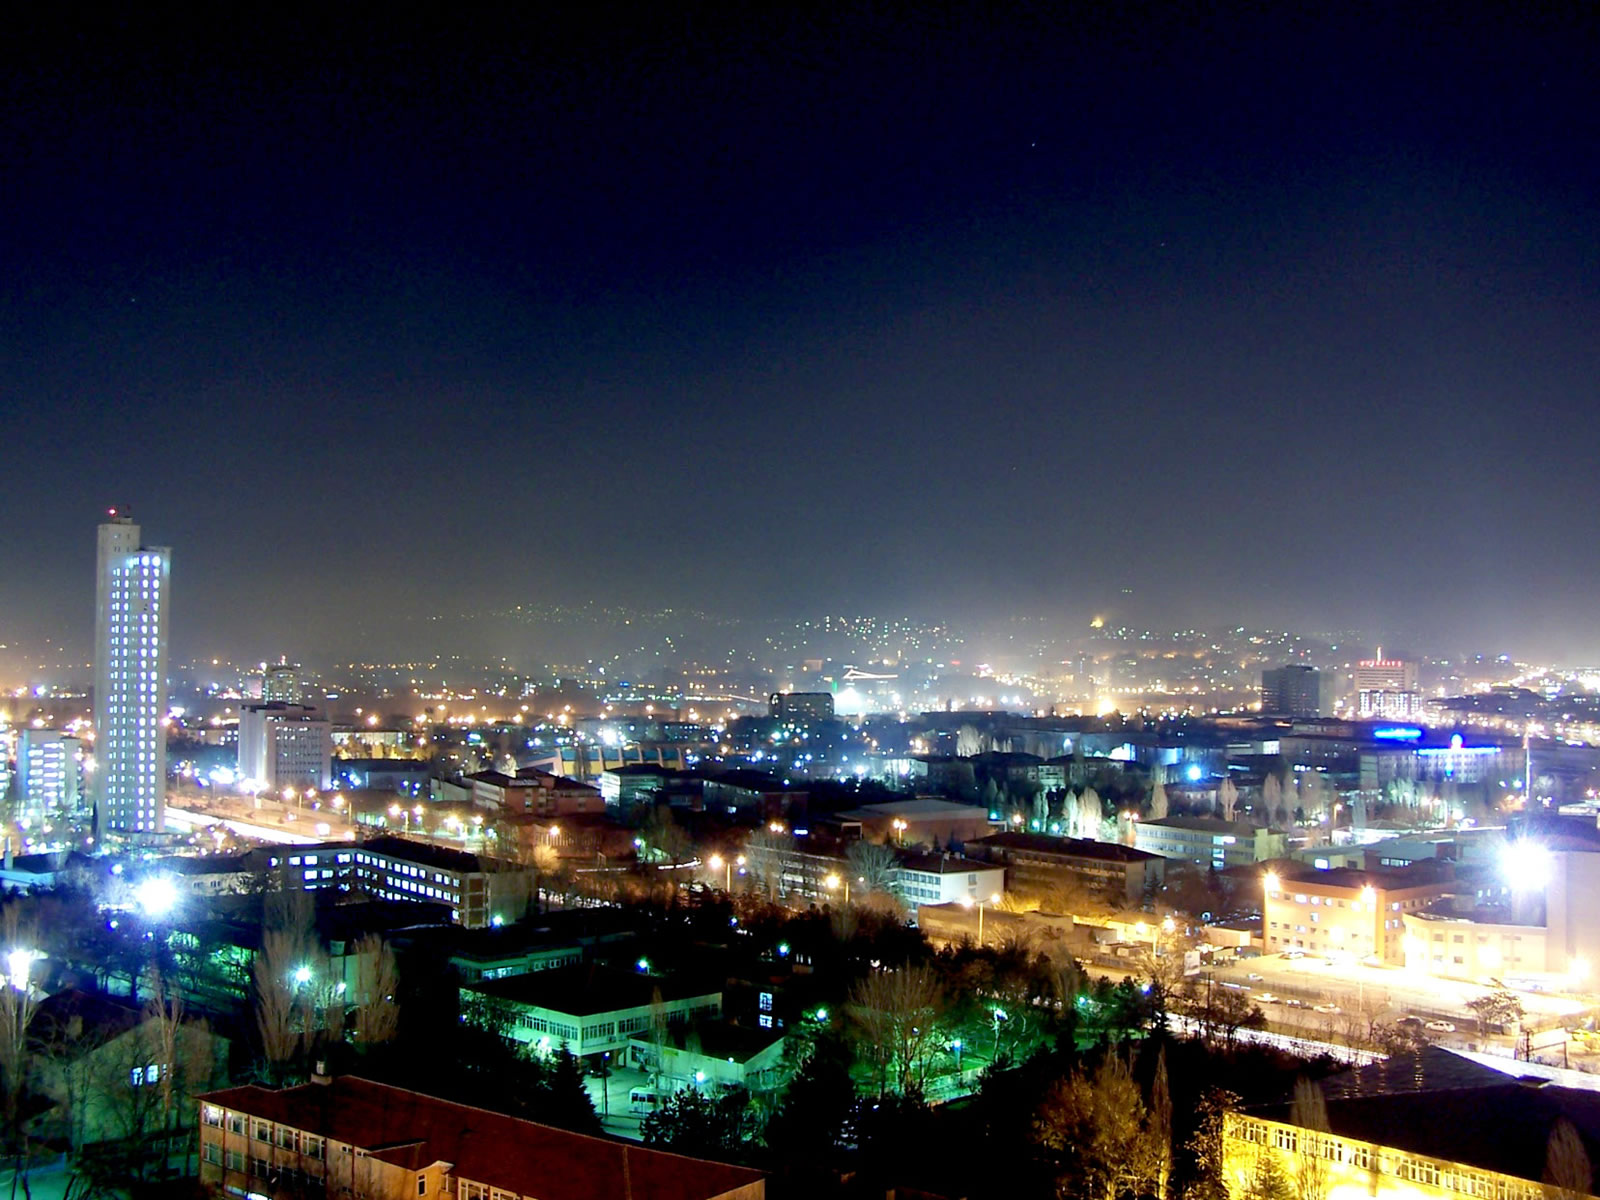 Ankara Otelleri - Otel Fiyatları | Otelcenneti.com